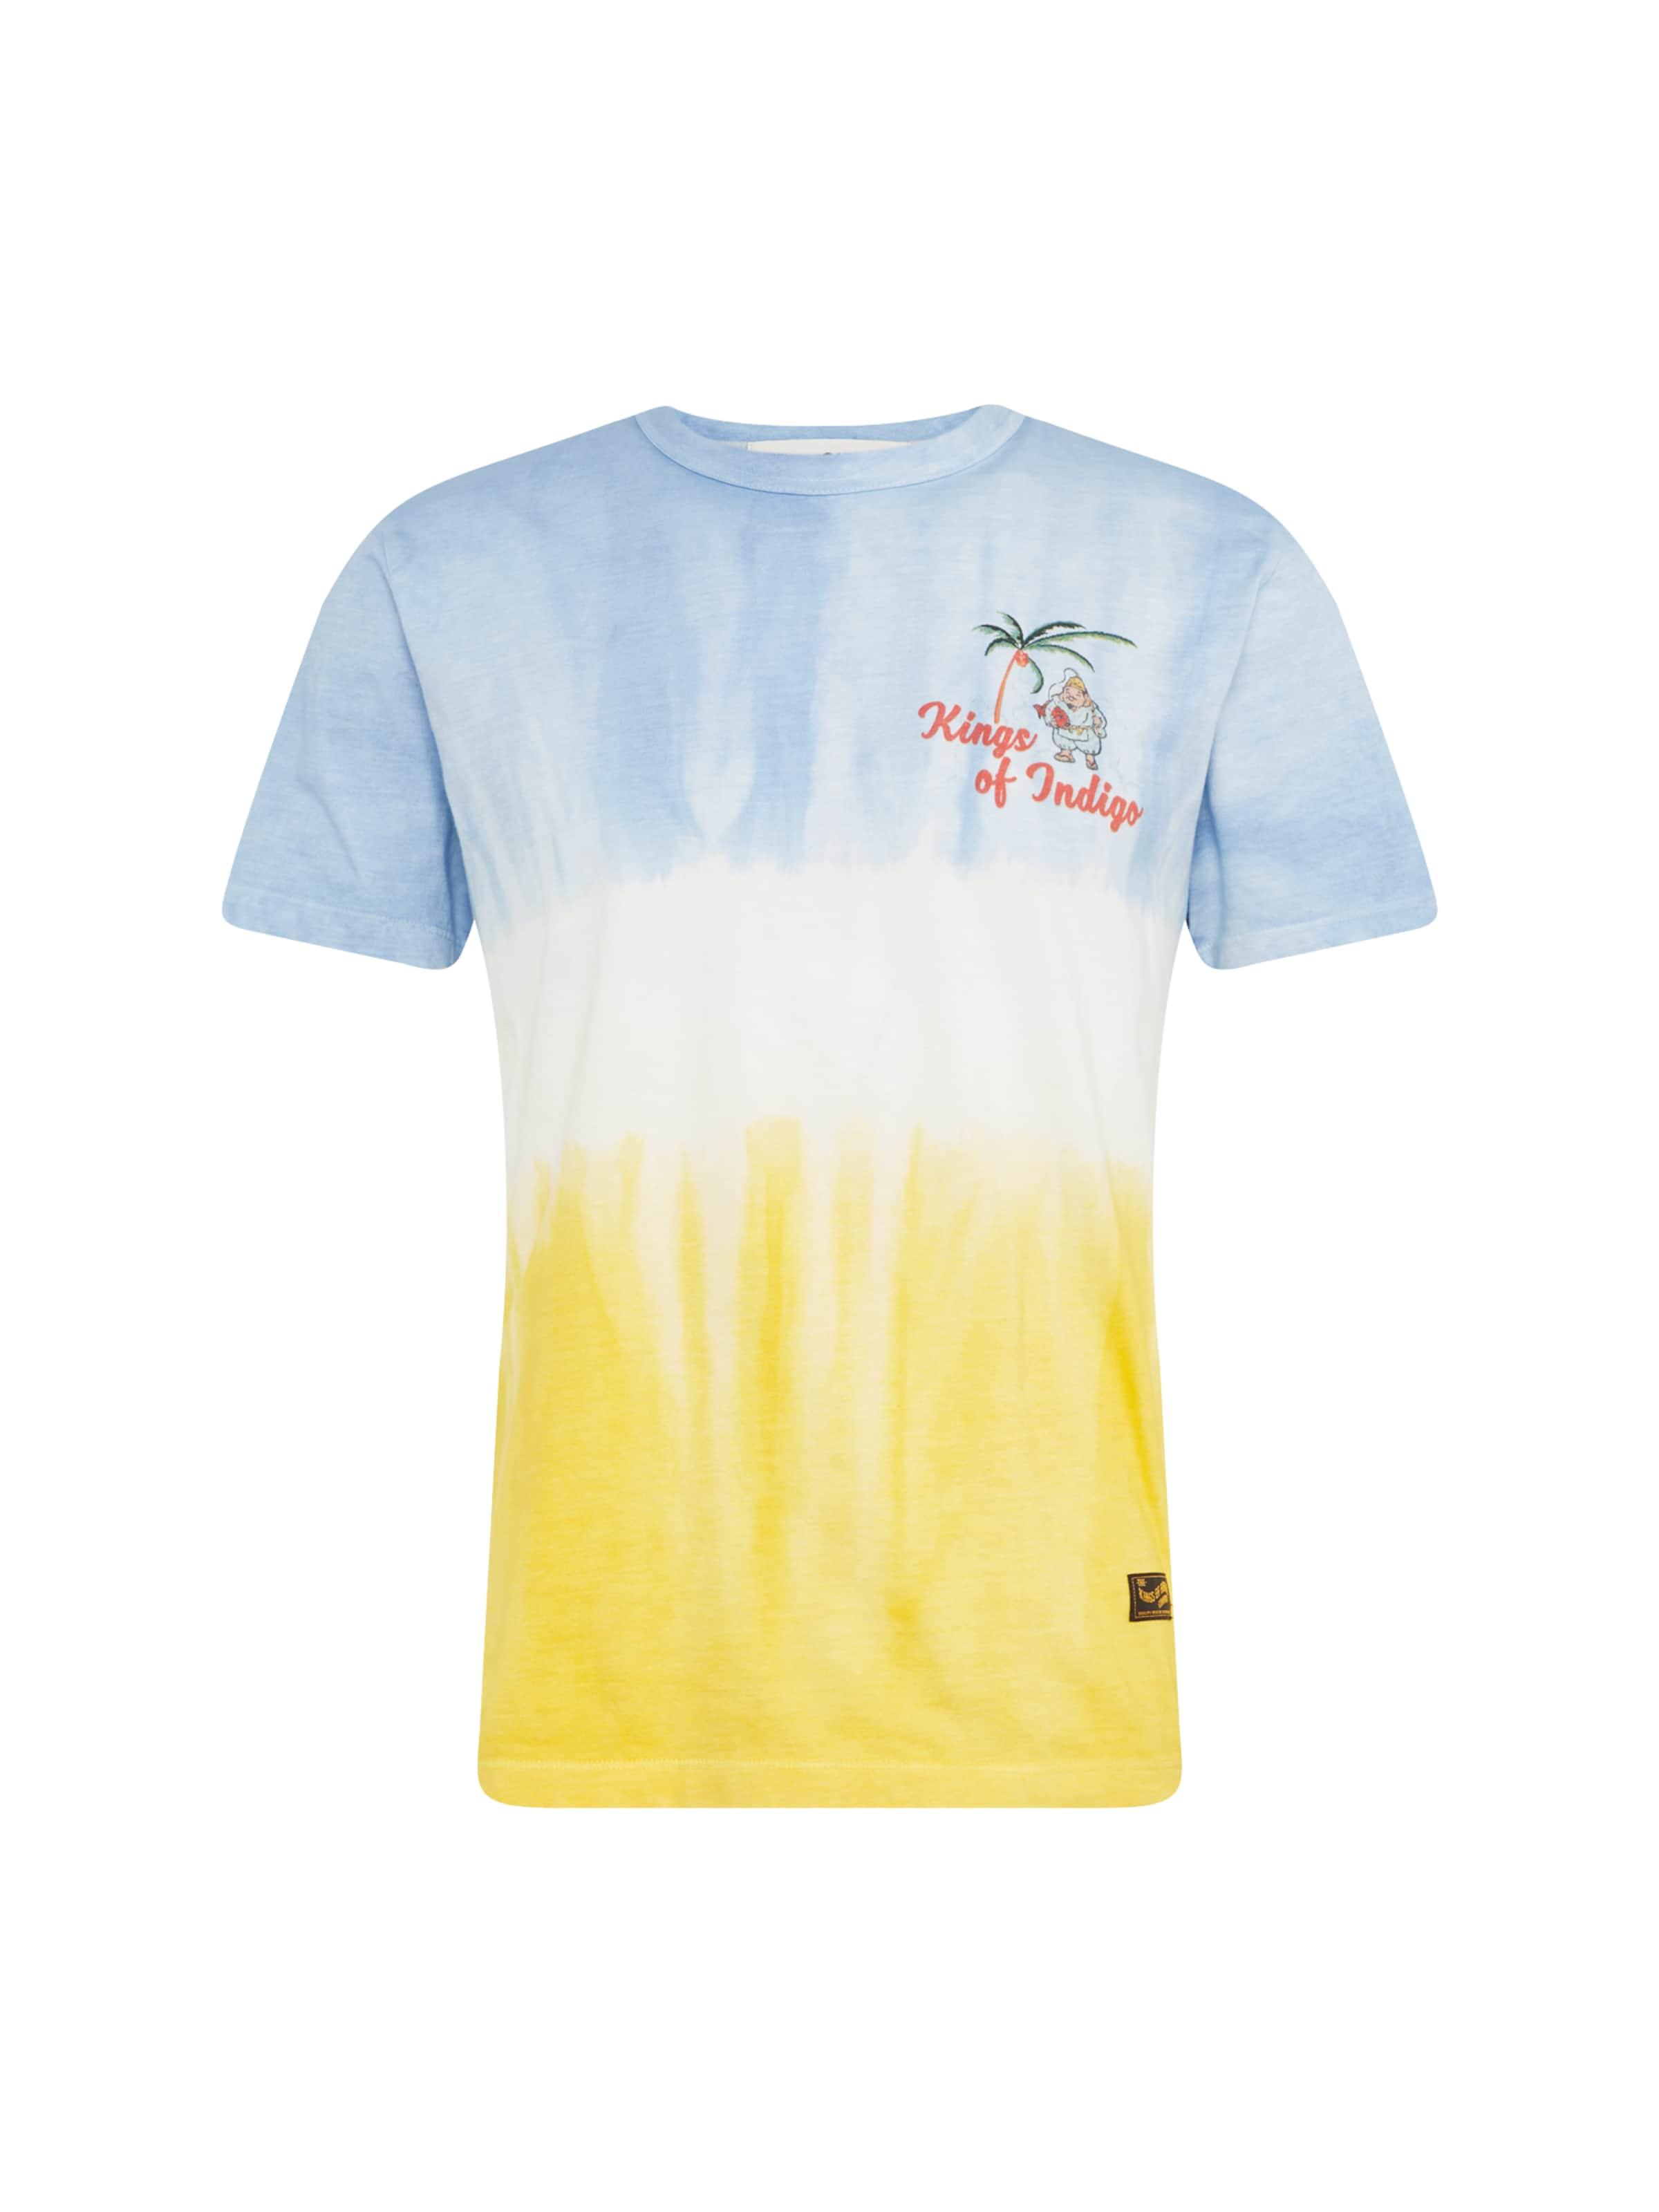 Indigo Kings Weiß Of 'darius' BlauGelb Shirt In iXZukOP